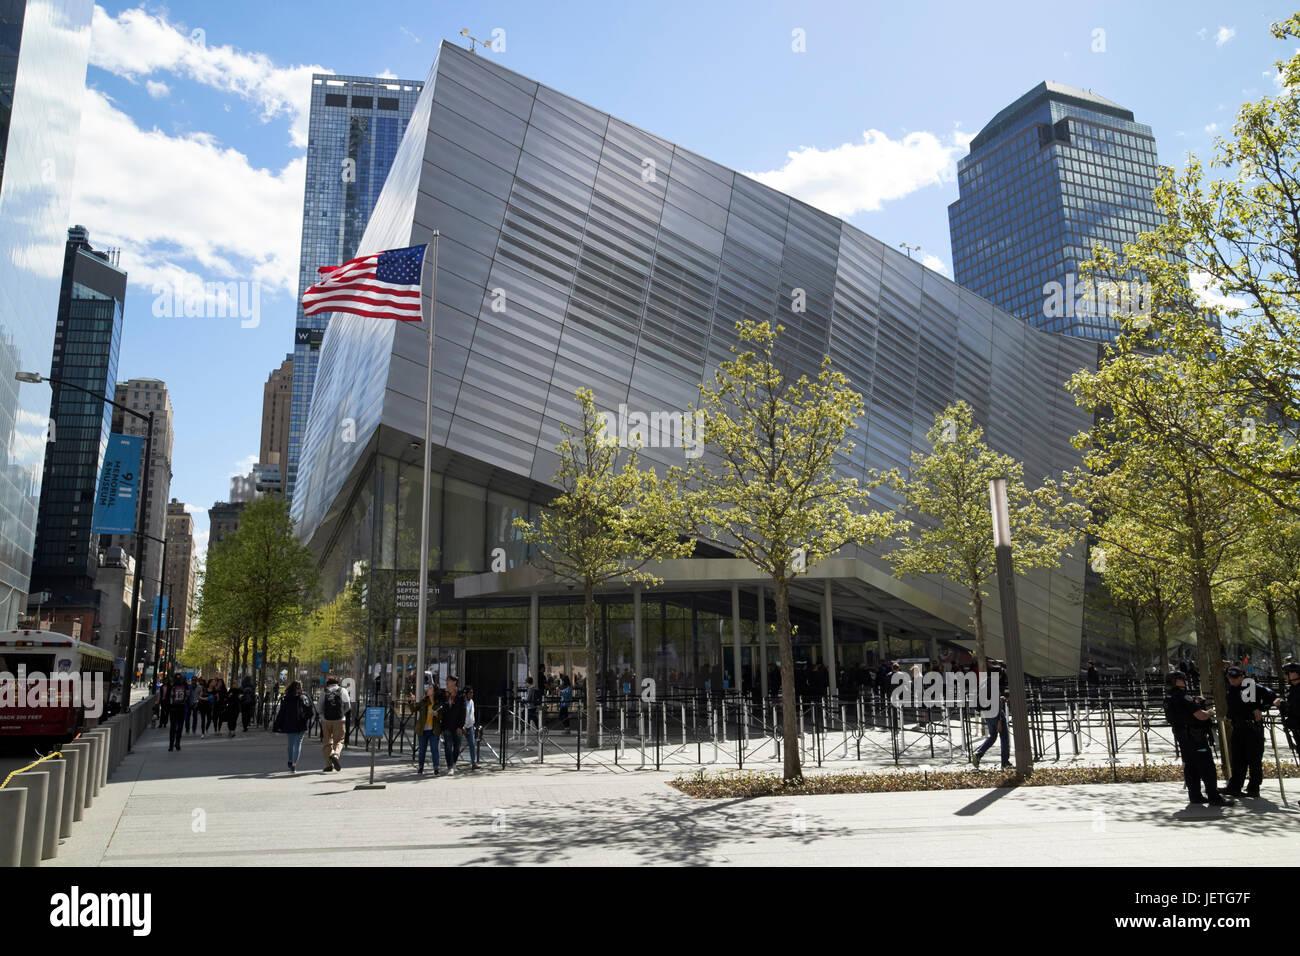 national september 11th memorial museum New York City USA - Stock Image